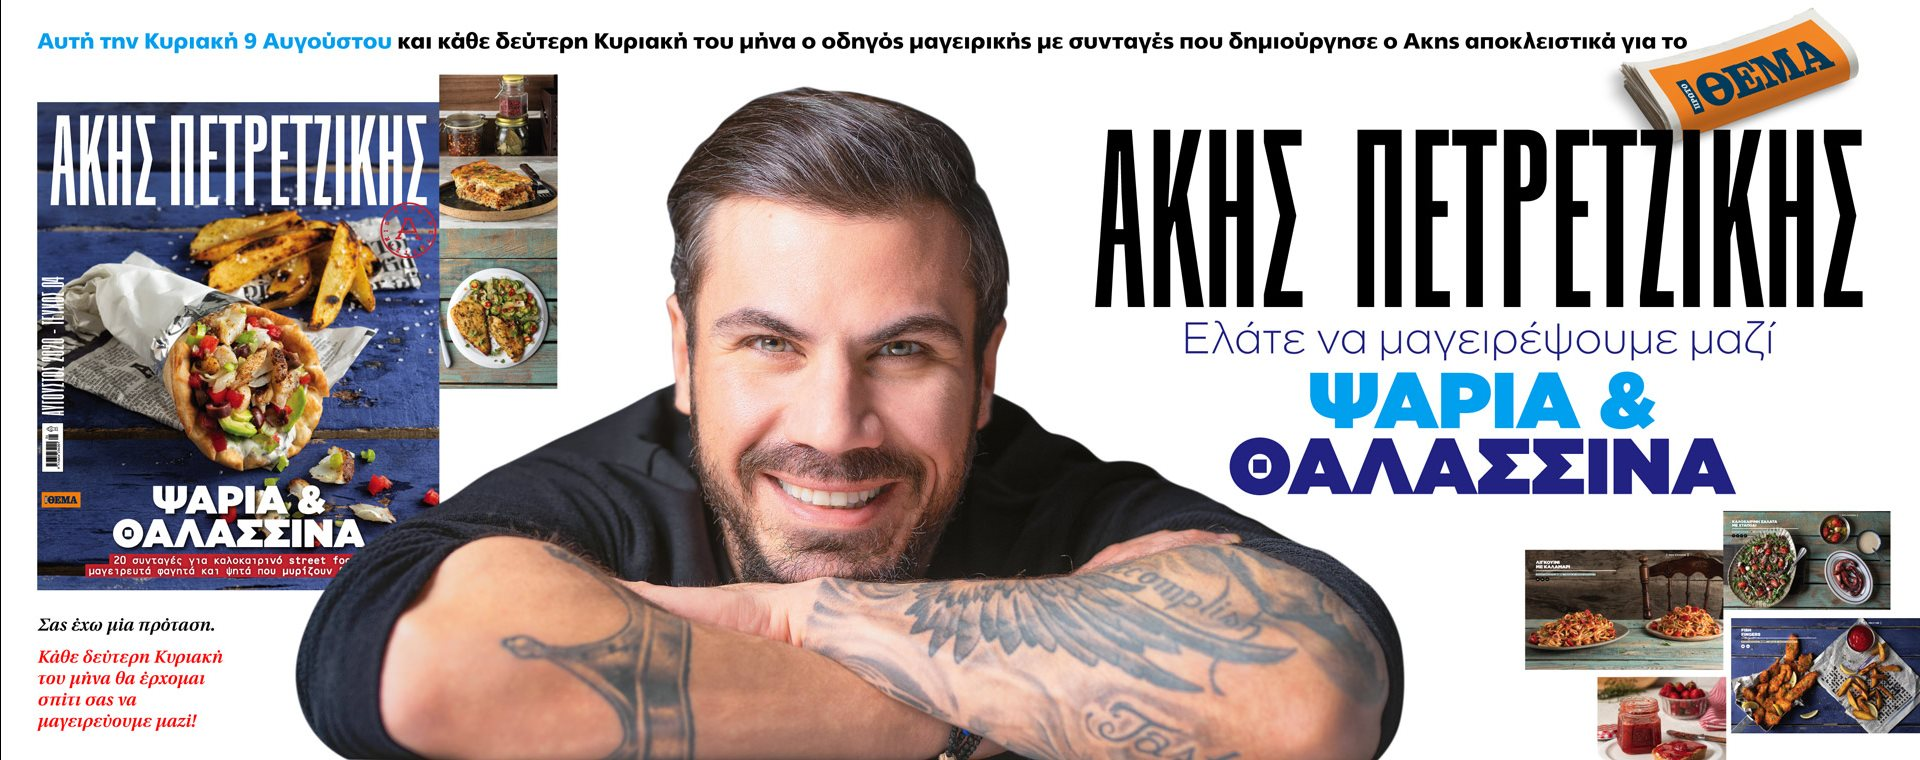 XRWMAakis